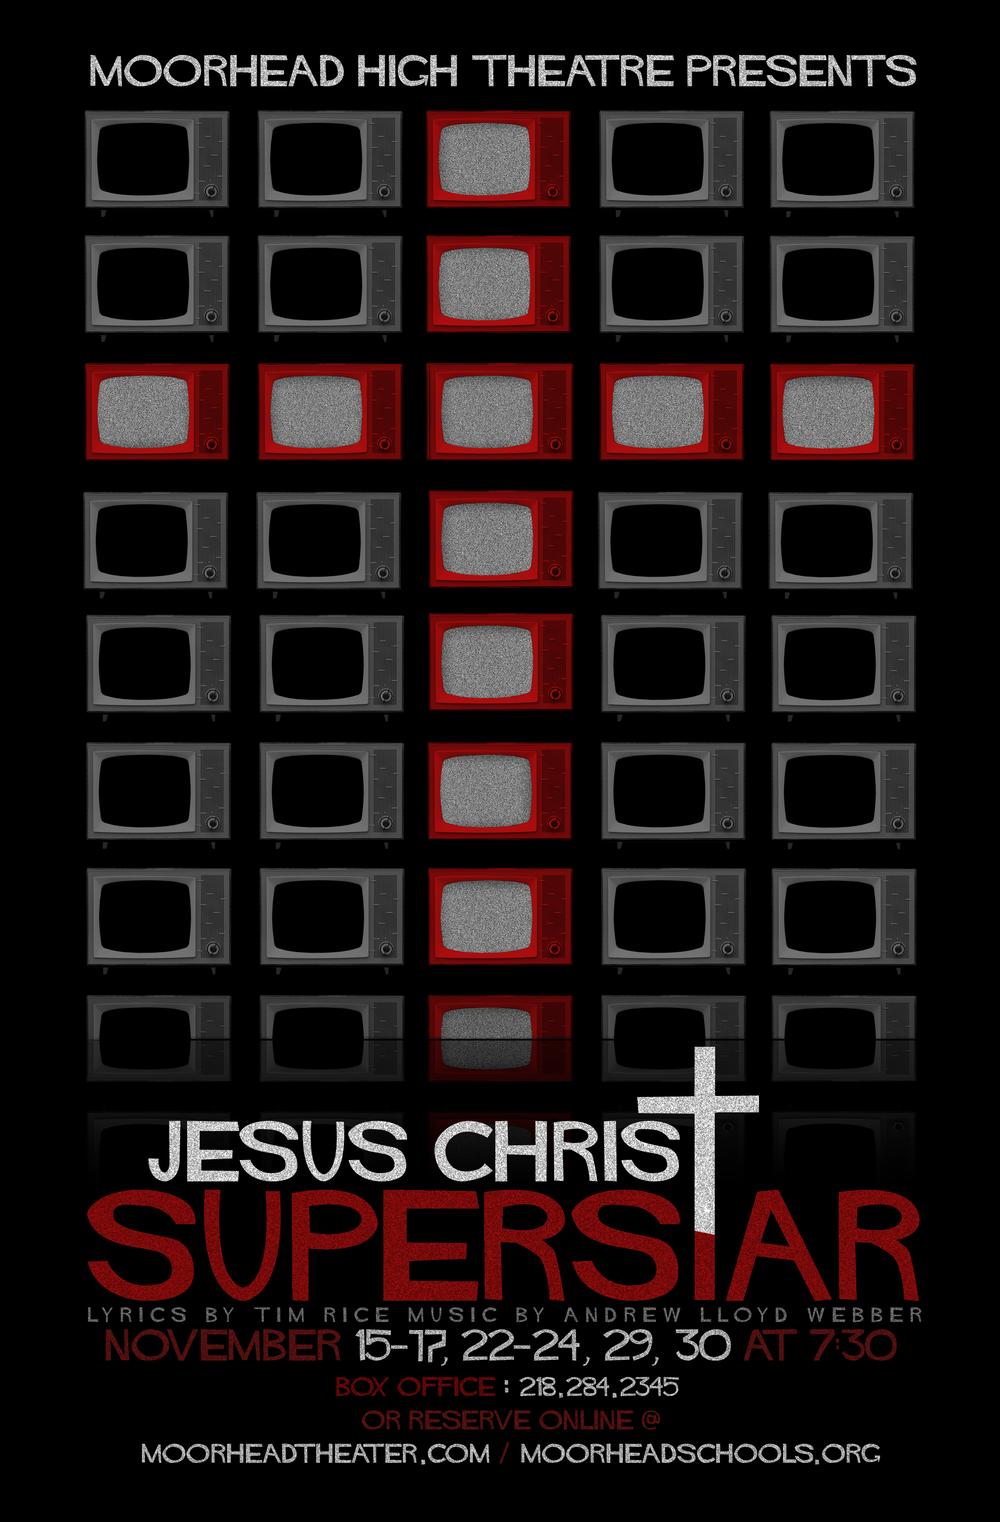 Poster designed for Moorhead High School's 2013 production of  Jesus Christ Superstar.